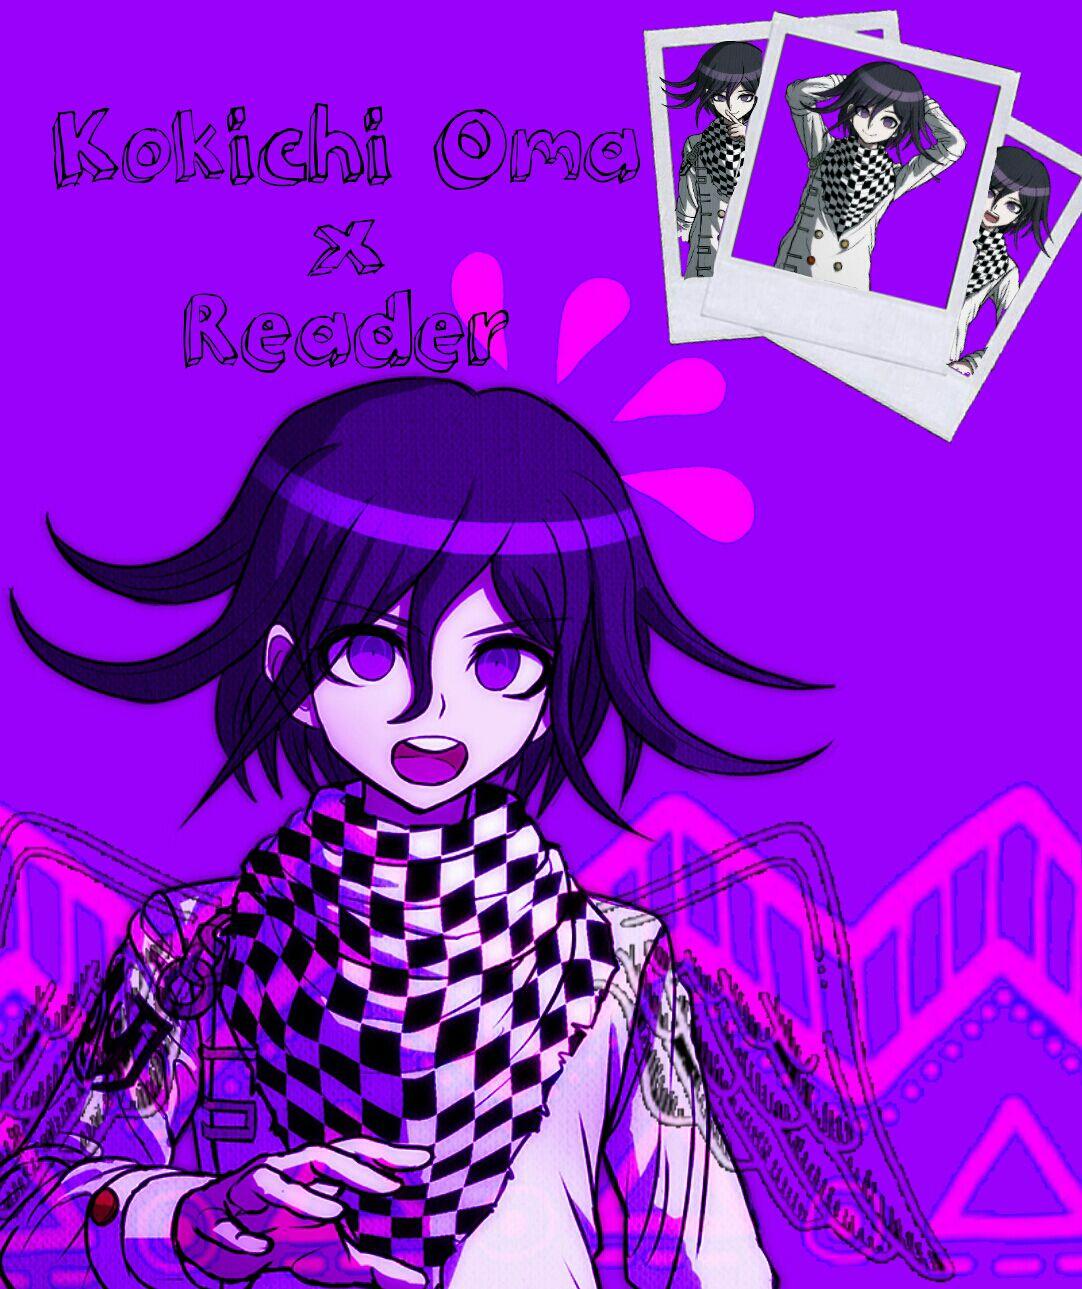 Kokichi Oma x Reader ONESHOTS (COMPLETED) - A/N: Kokichi x